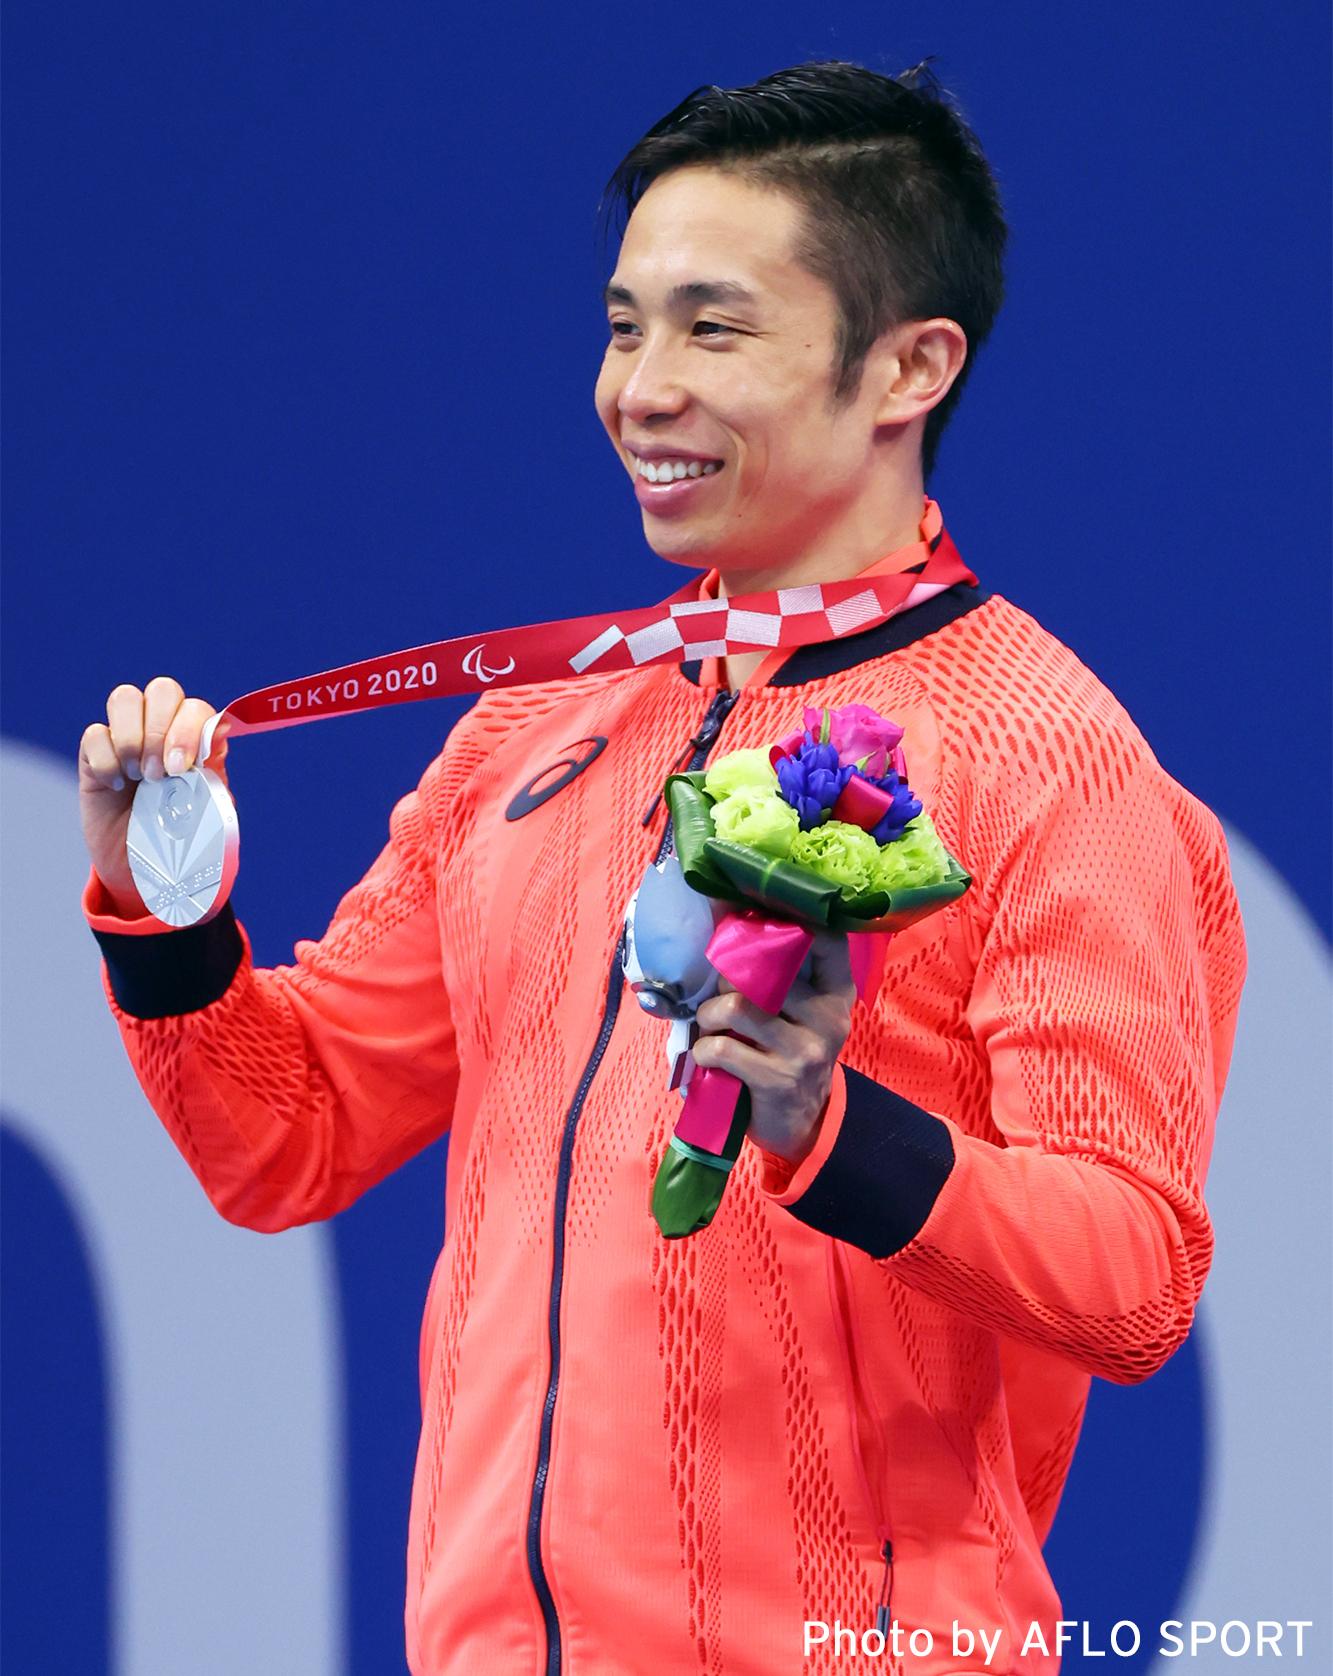 EY Japan所属 富田宇宙選手の東京2020パラリンピック銀メダル獲得のお知らせ